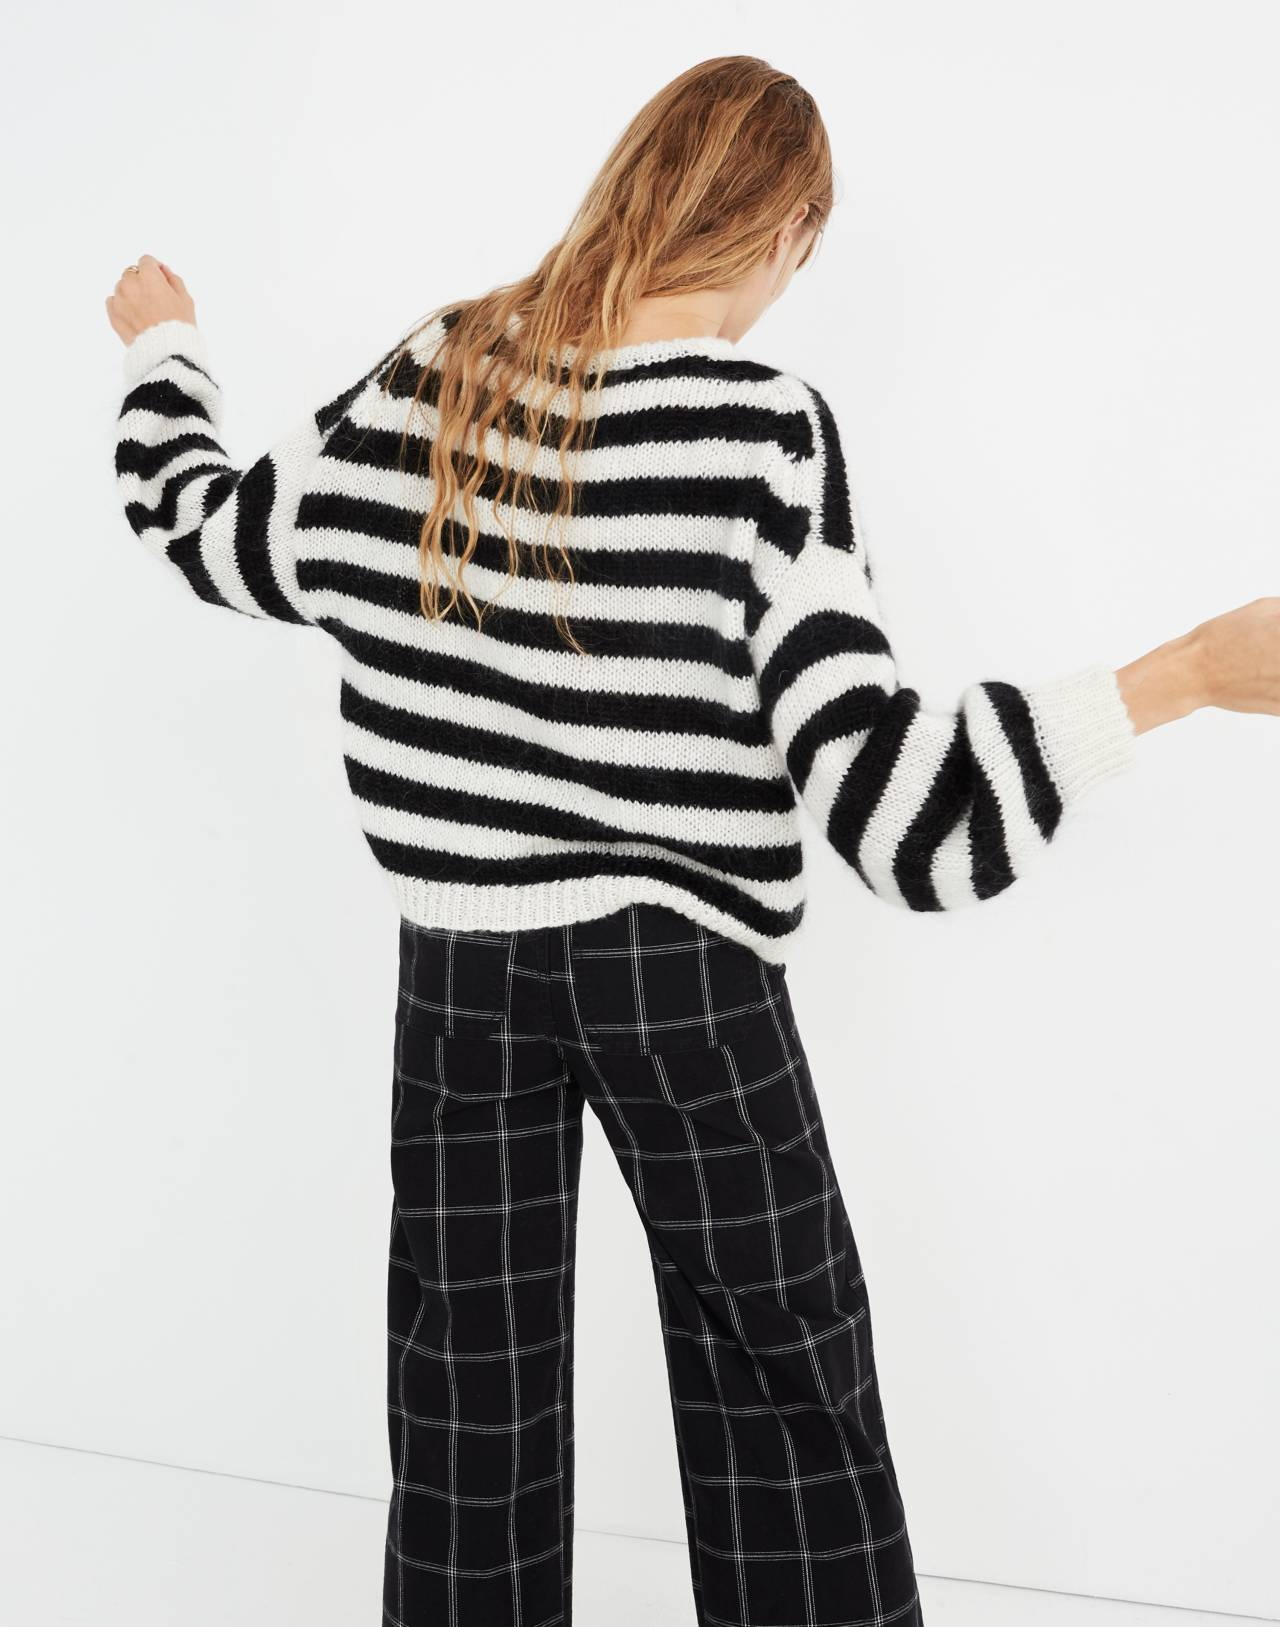 Balloon-Sleeve Pullover Sweater in Stripe in true black image 3